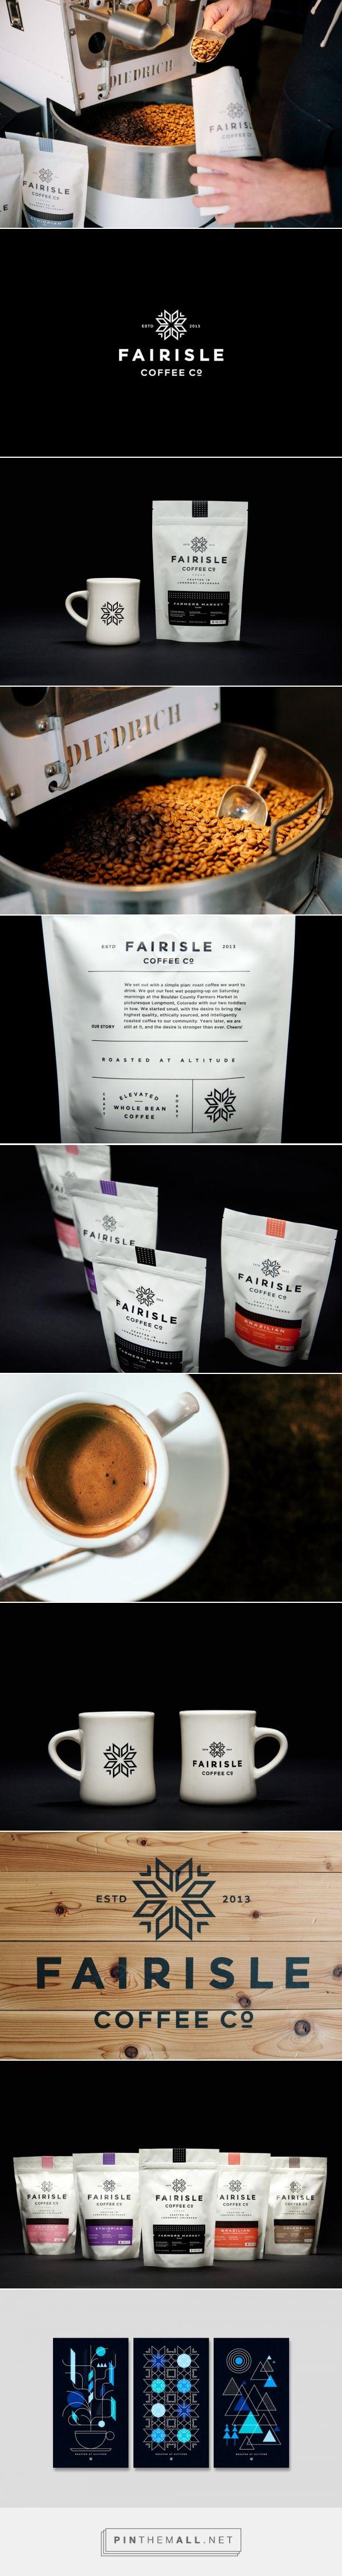 Fairisle Coffee — Steve Wolf Designs - created via https://pinthemall.net